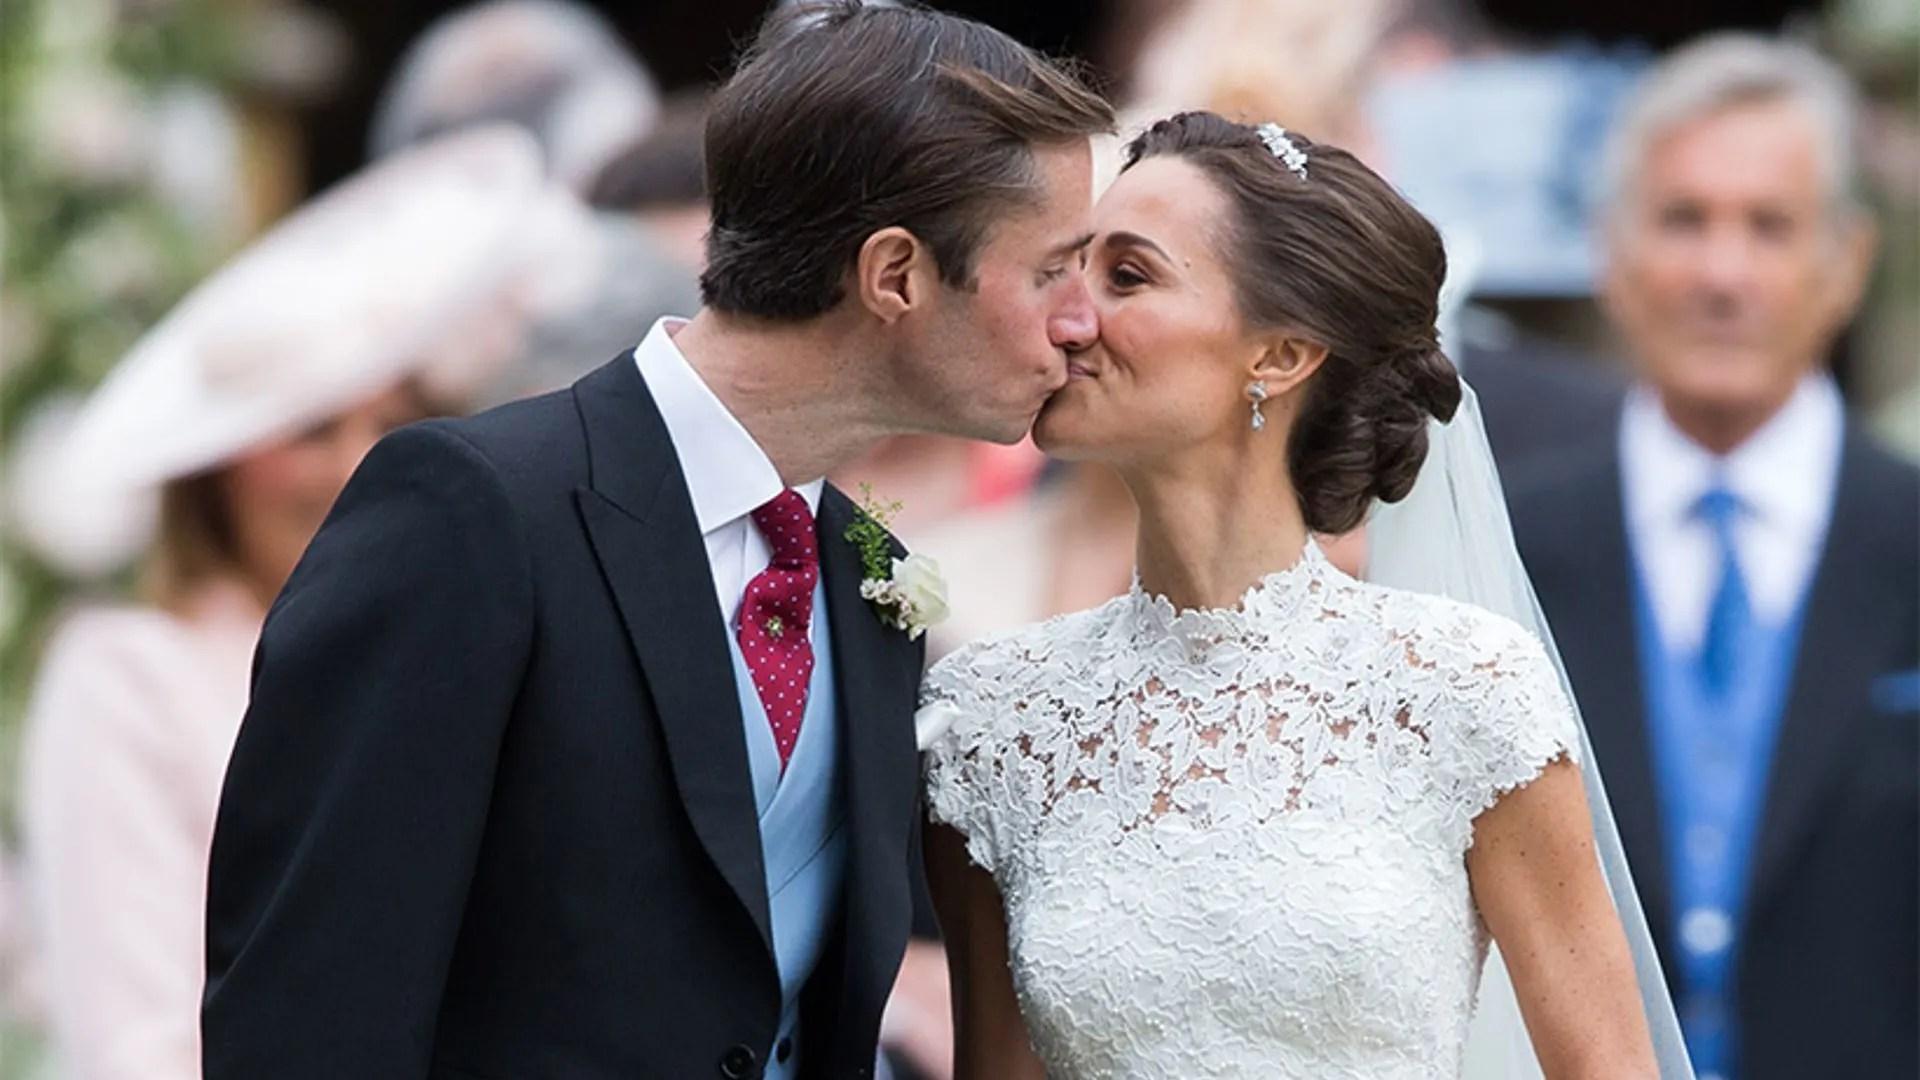 Pippa Middleton Wedding: Prince Harry's Menu Card Up For Sale